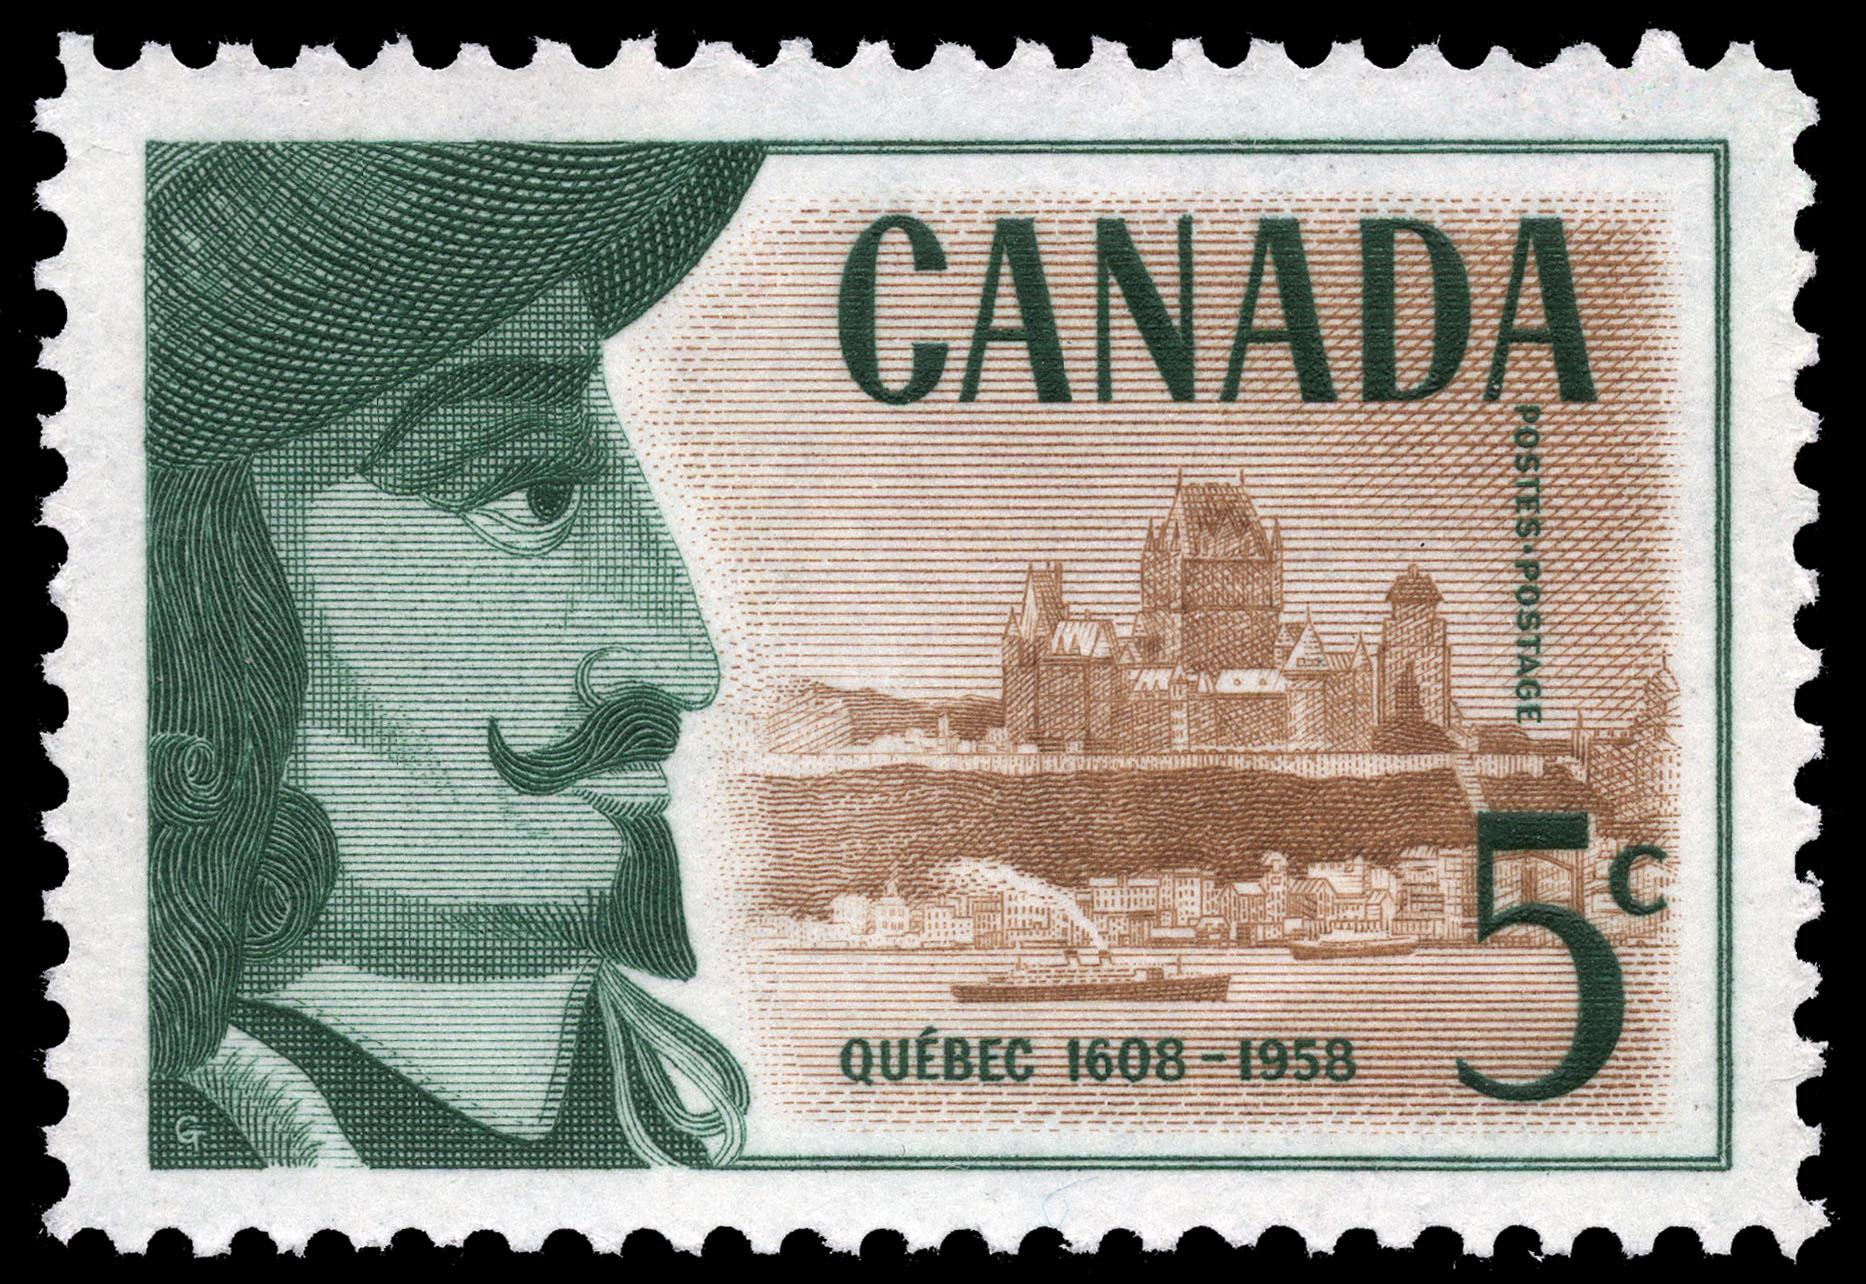 Quebec, 1608-1958 Canada Postage Stamp